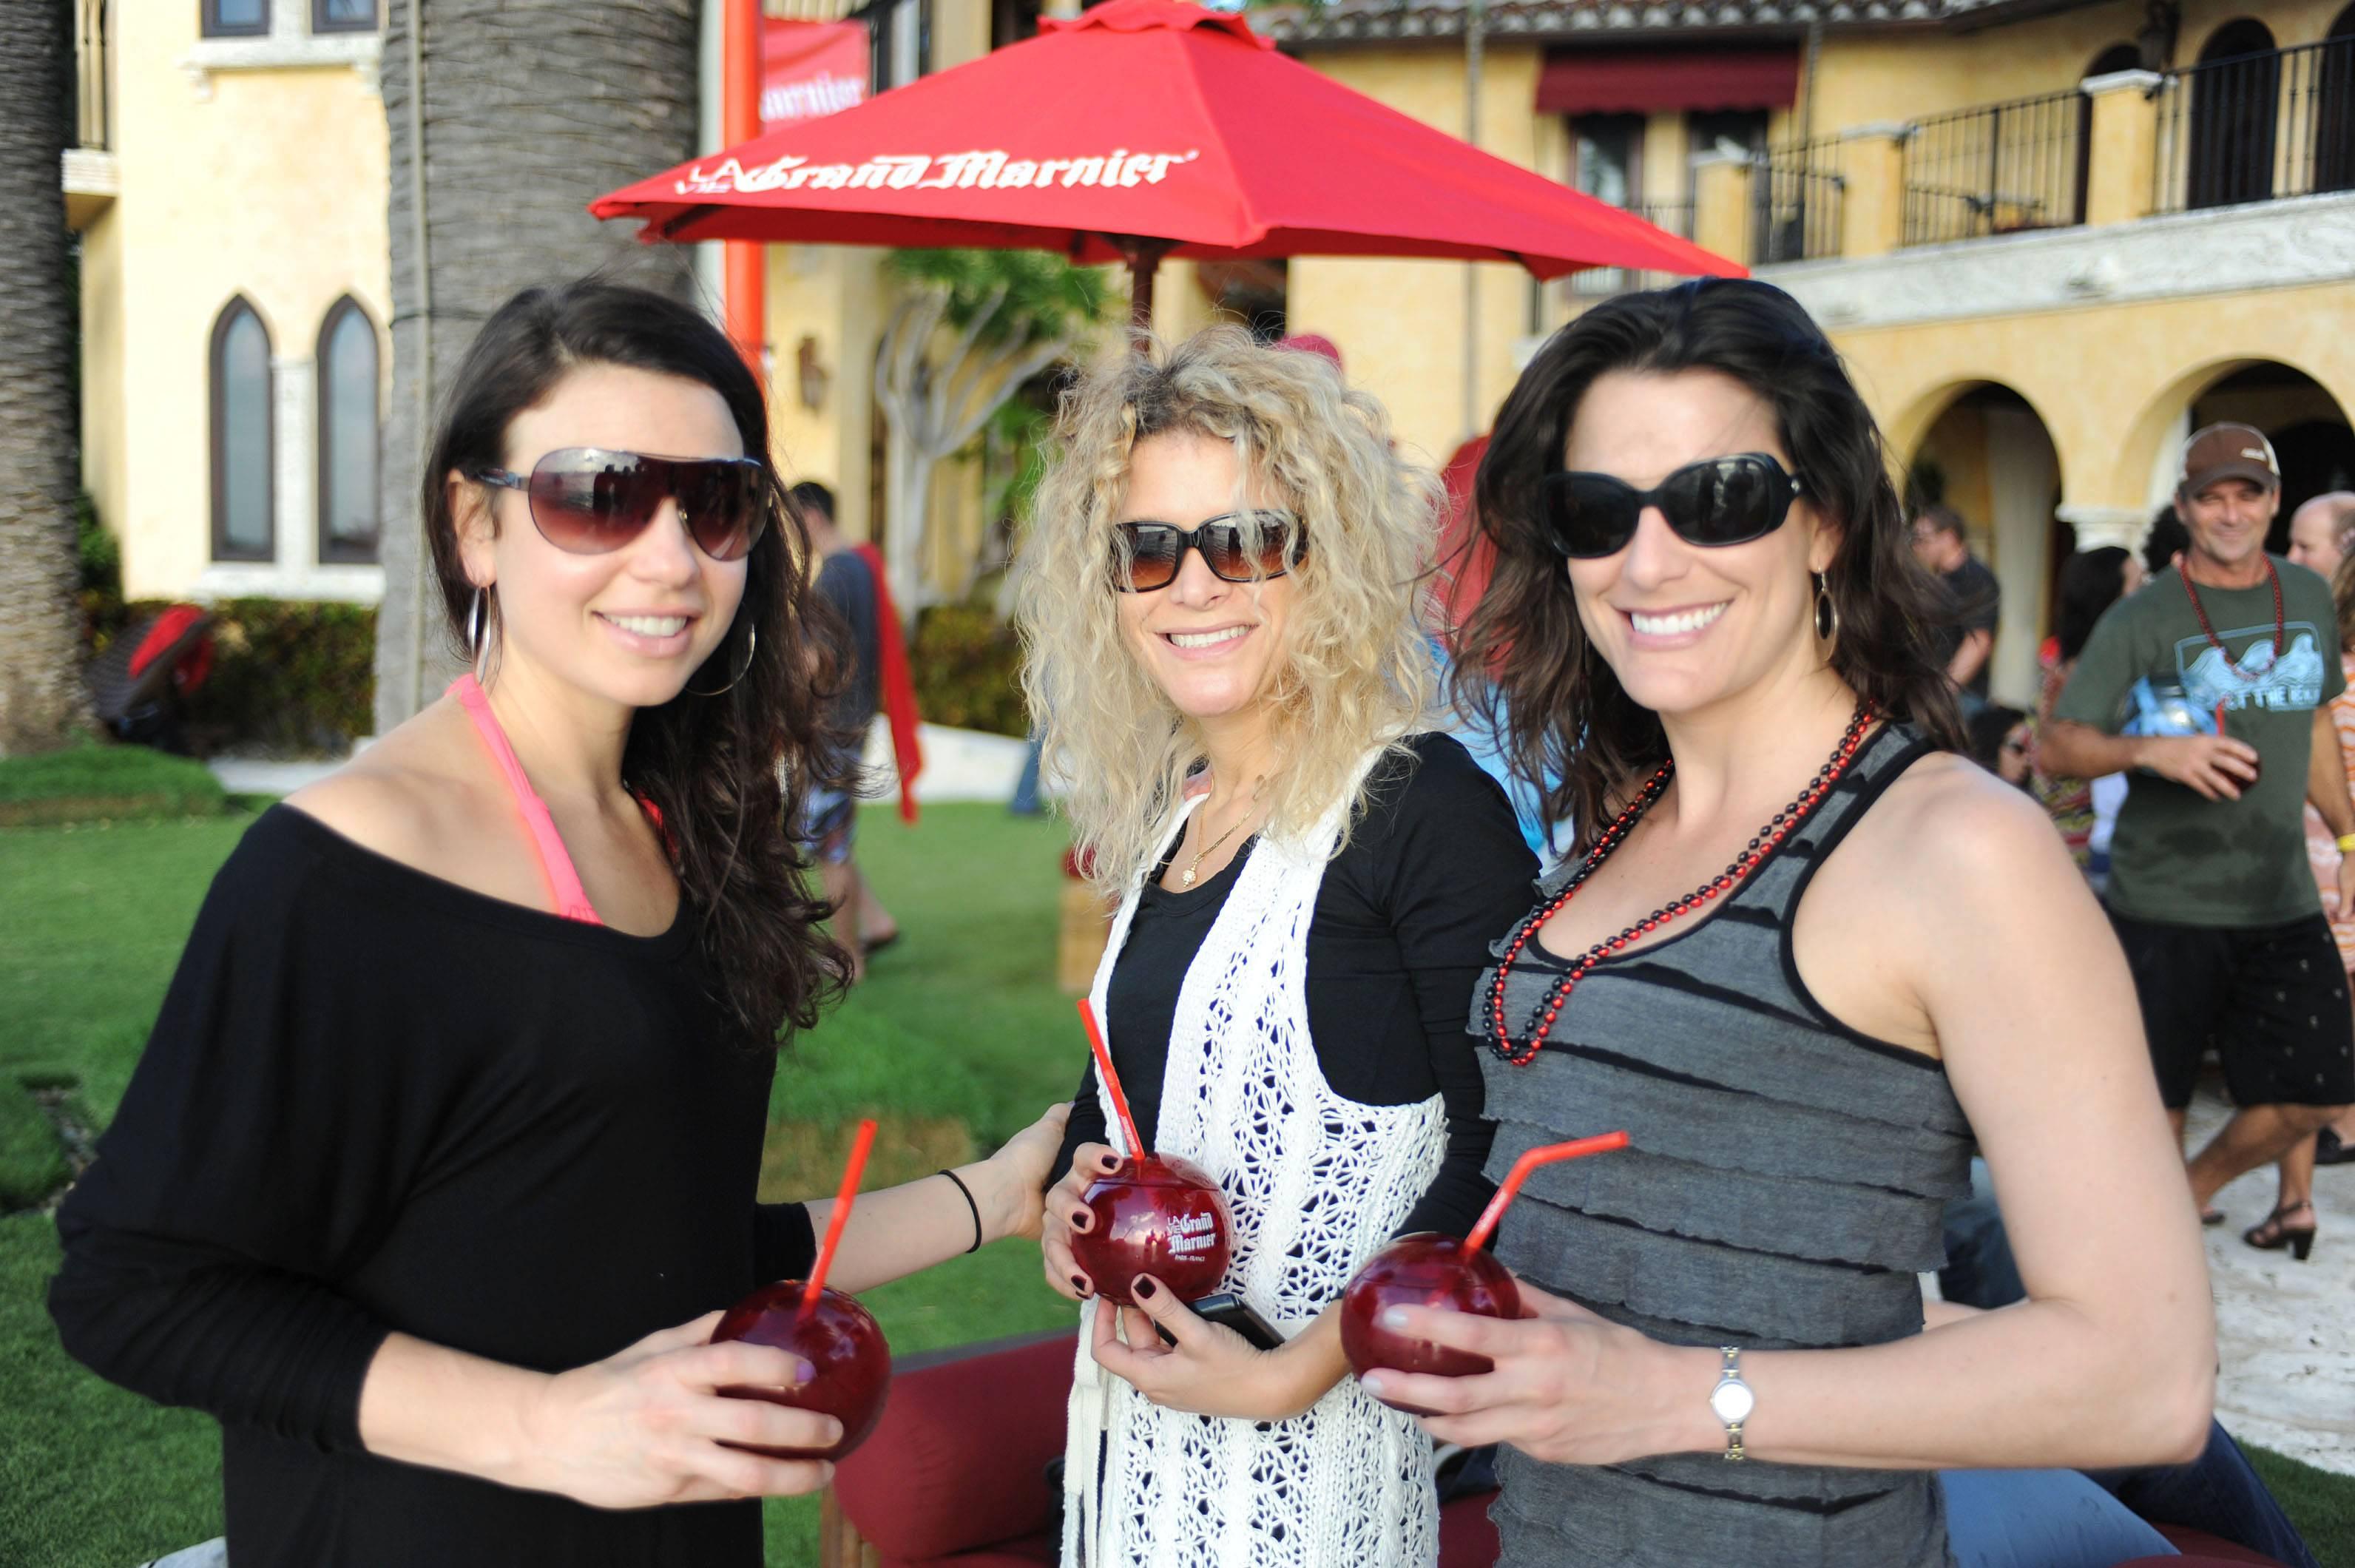 Meredith Miller, Clarissa Lewis, & Katherine Wald3